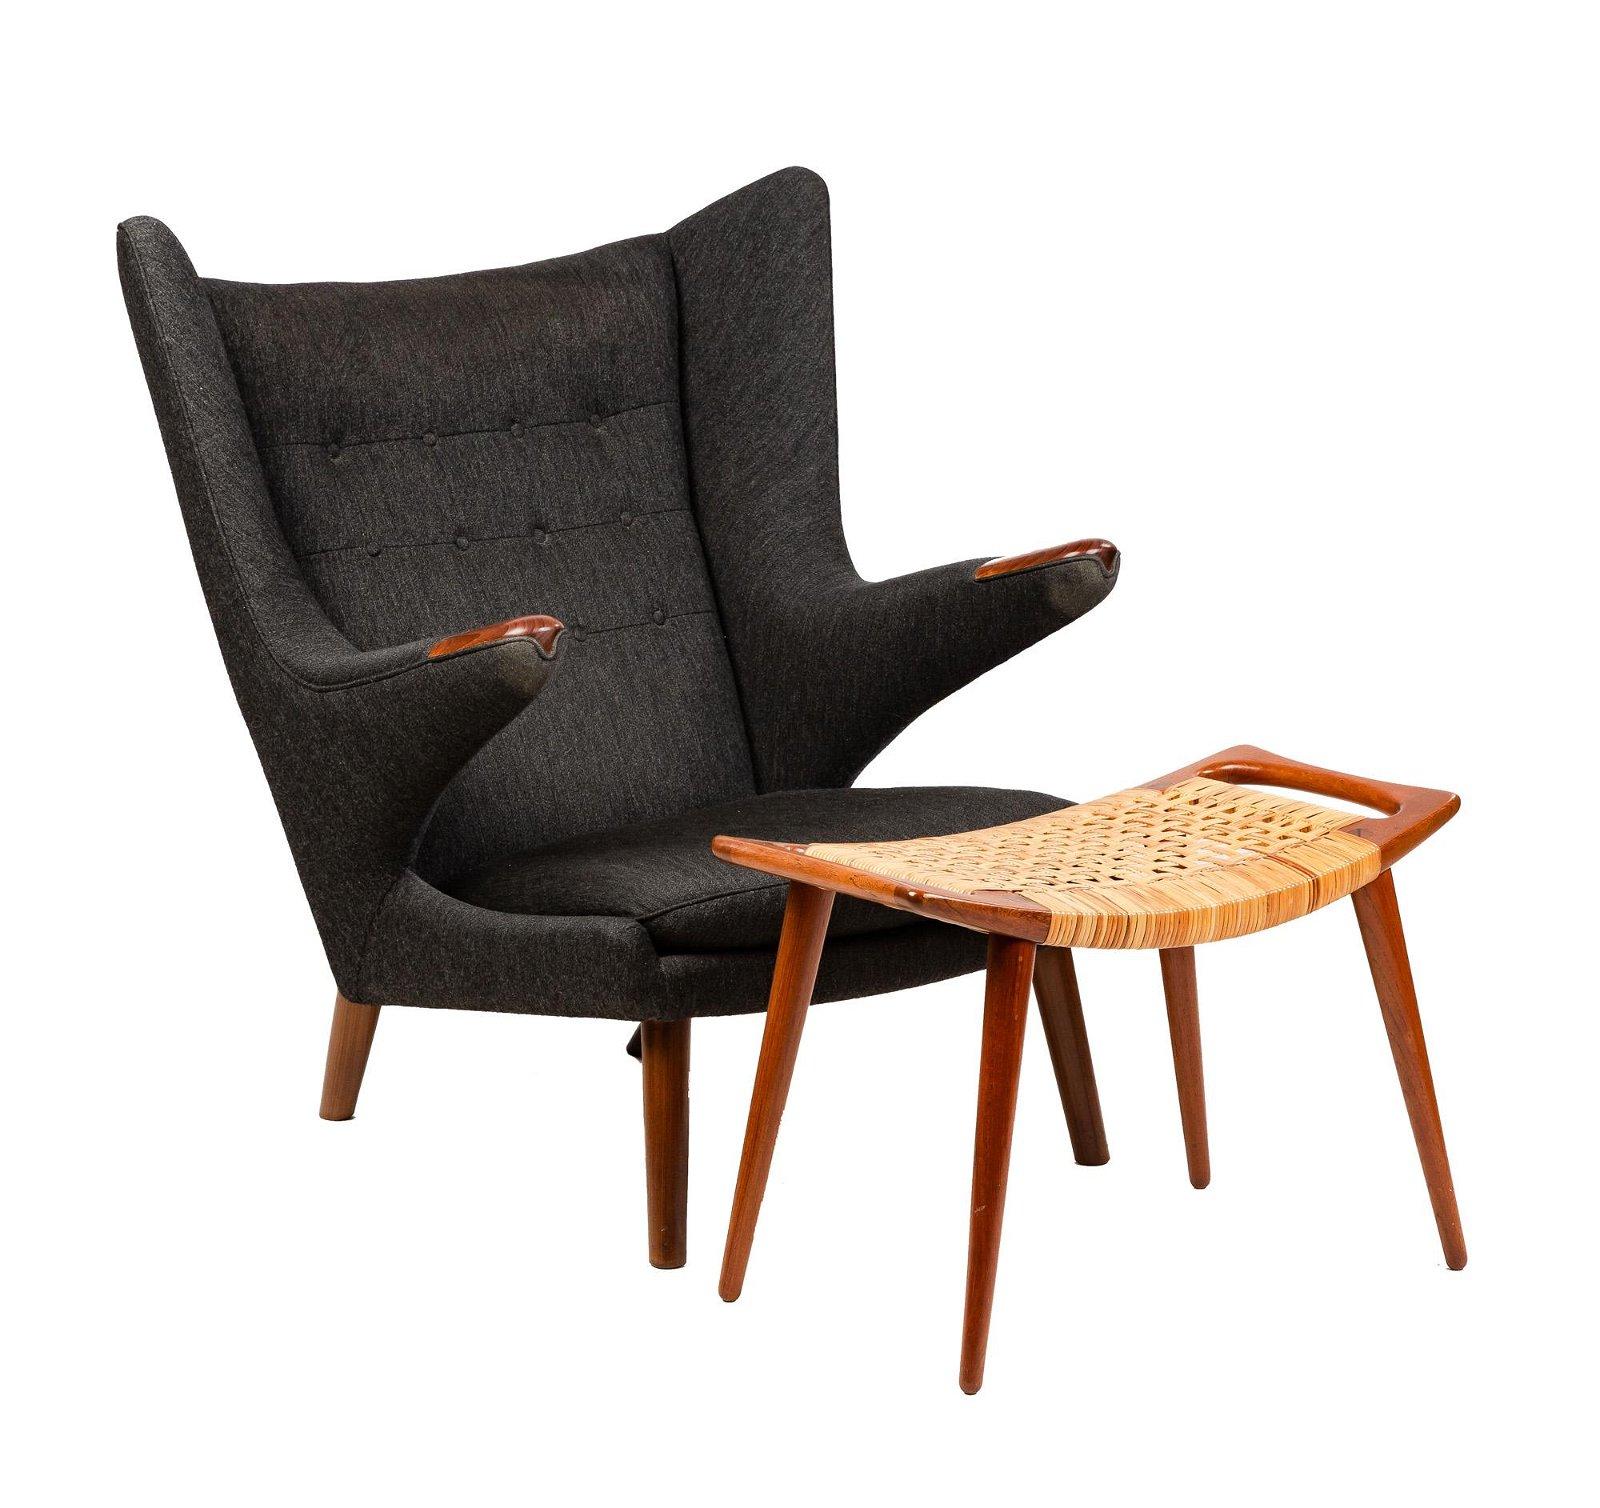 Hans J. Wegner (Danish, 1914-2007) Papa Bear Chair and